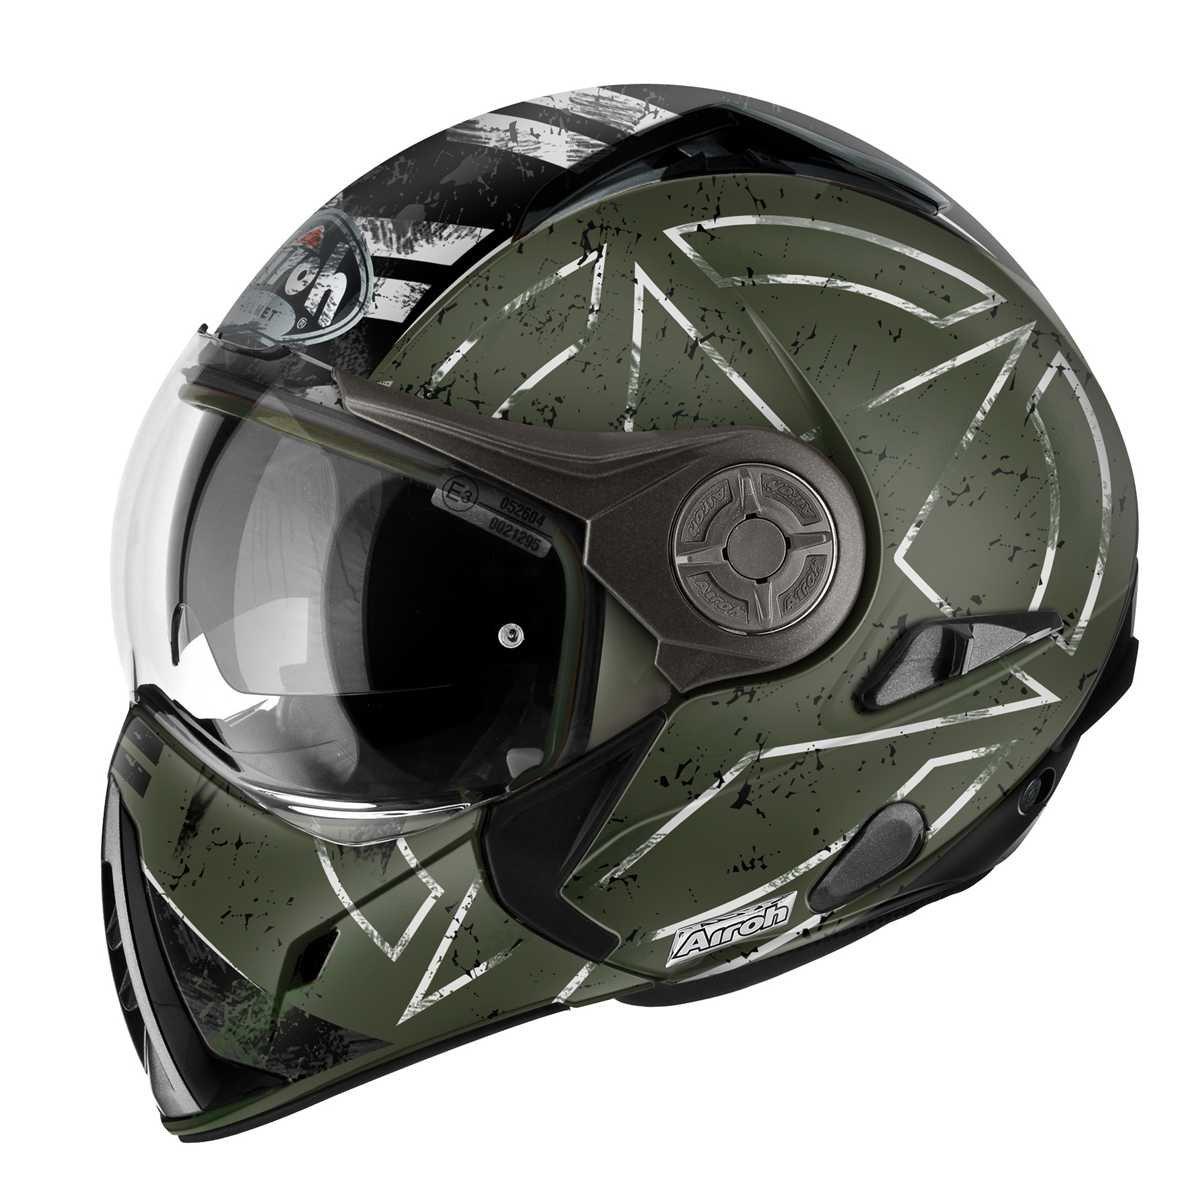 Command Green 60-L Vert Airoh Casque de Moto Modulaire